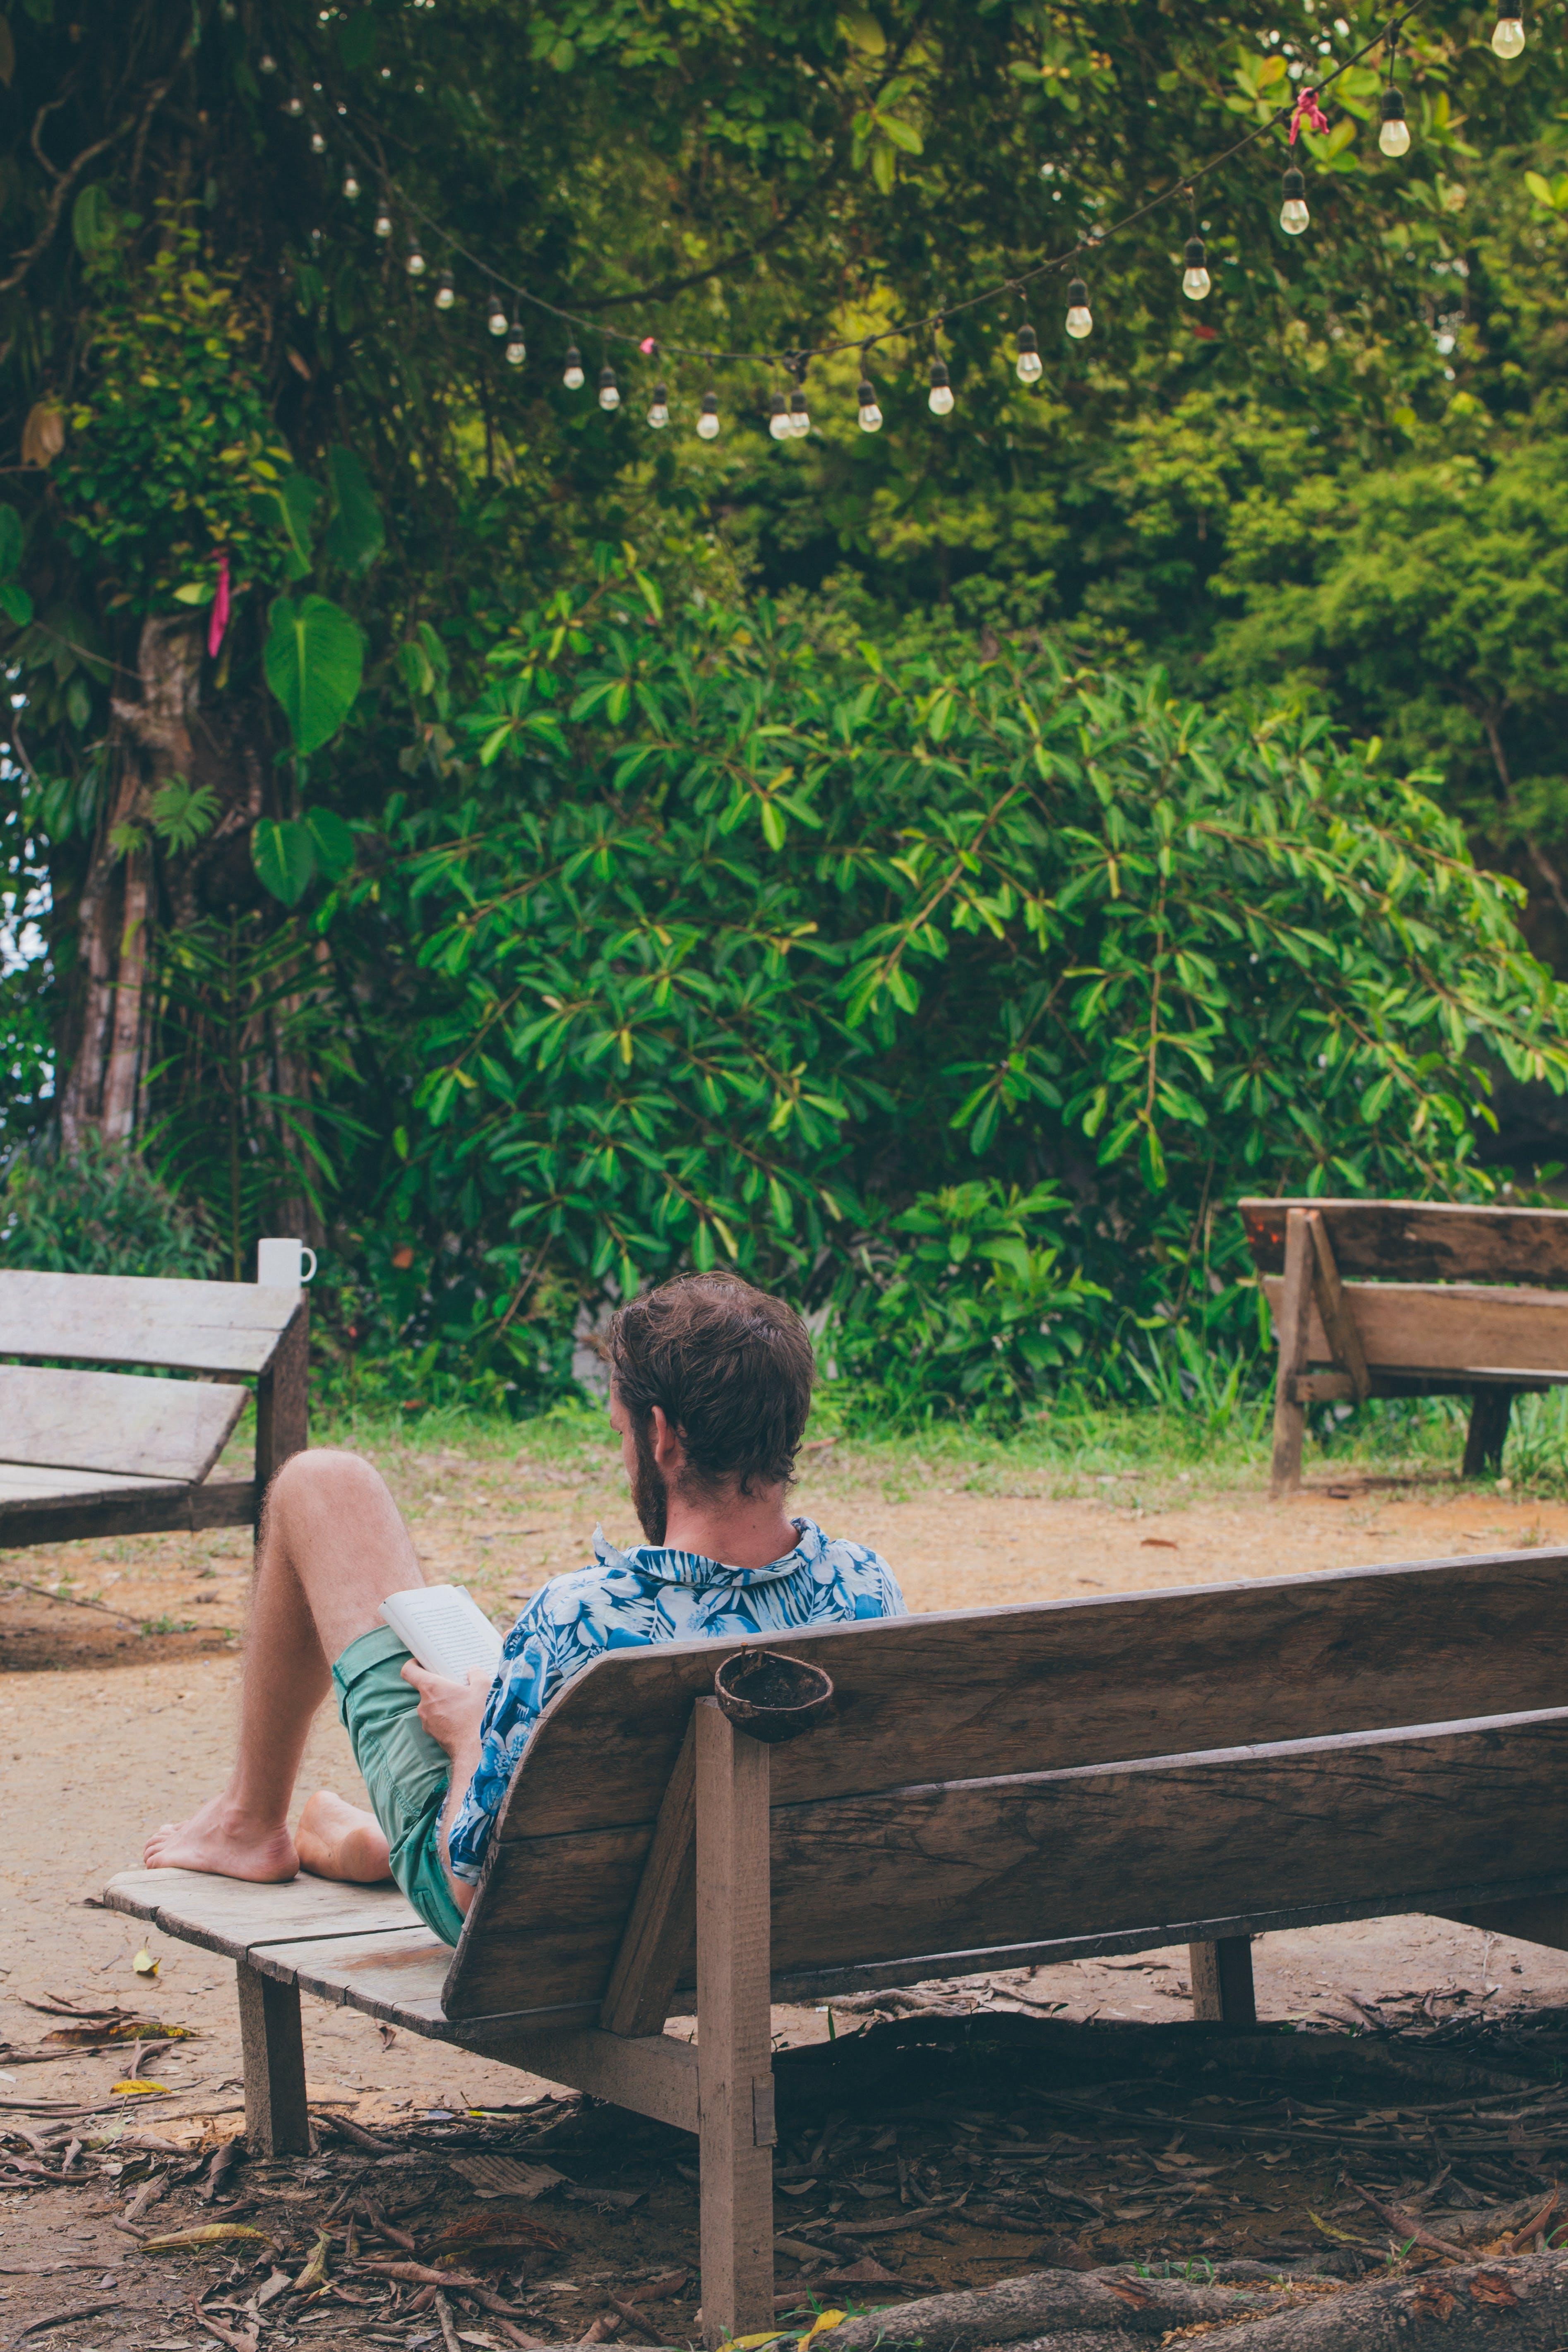 Man Reading Book Sitting on Bench Near Trees